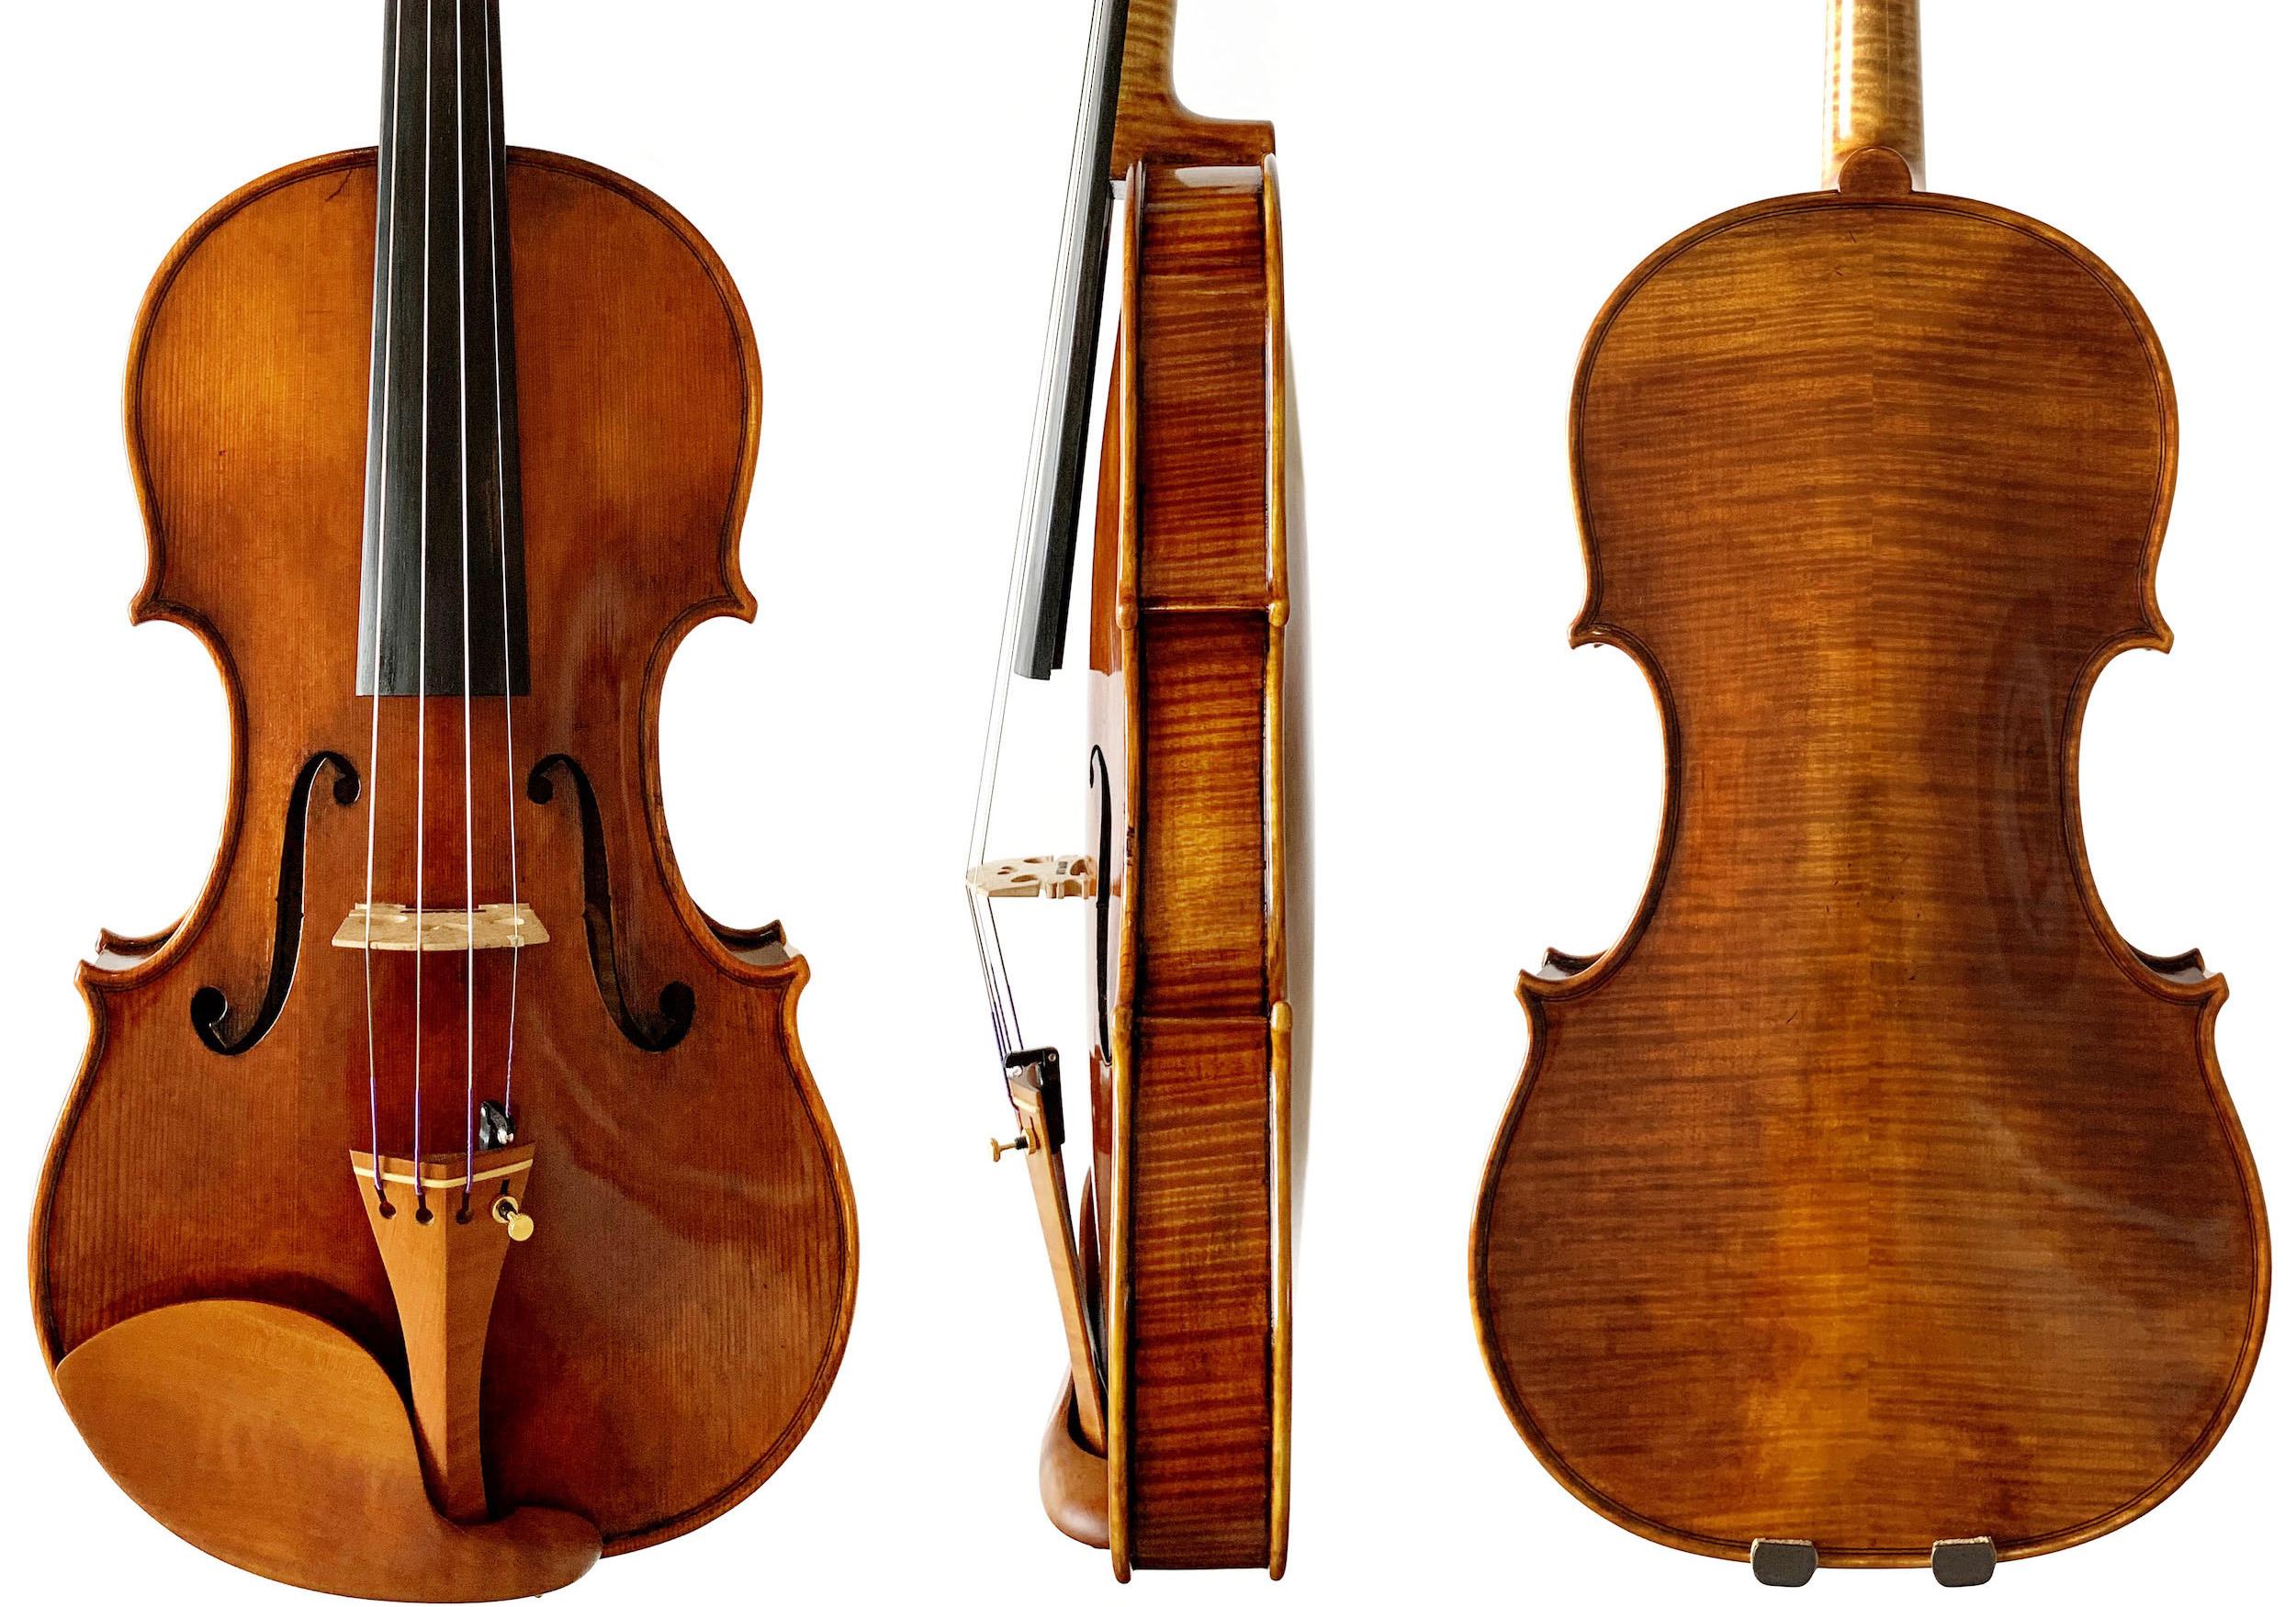 Dimitrov violin front, side and back